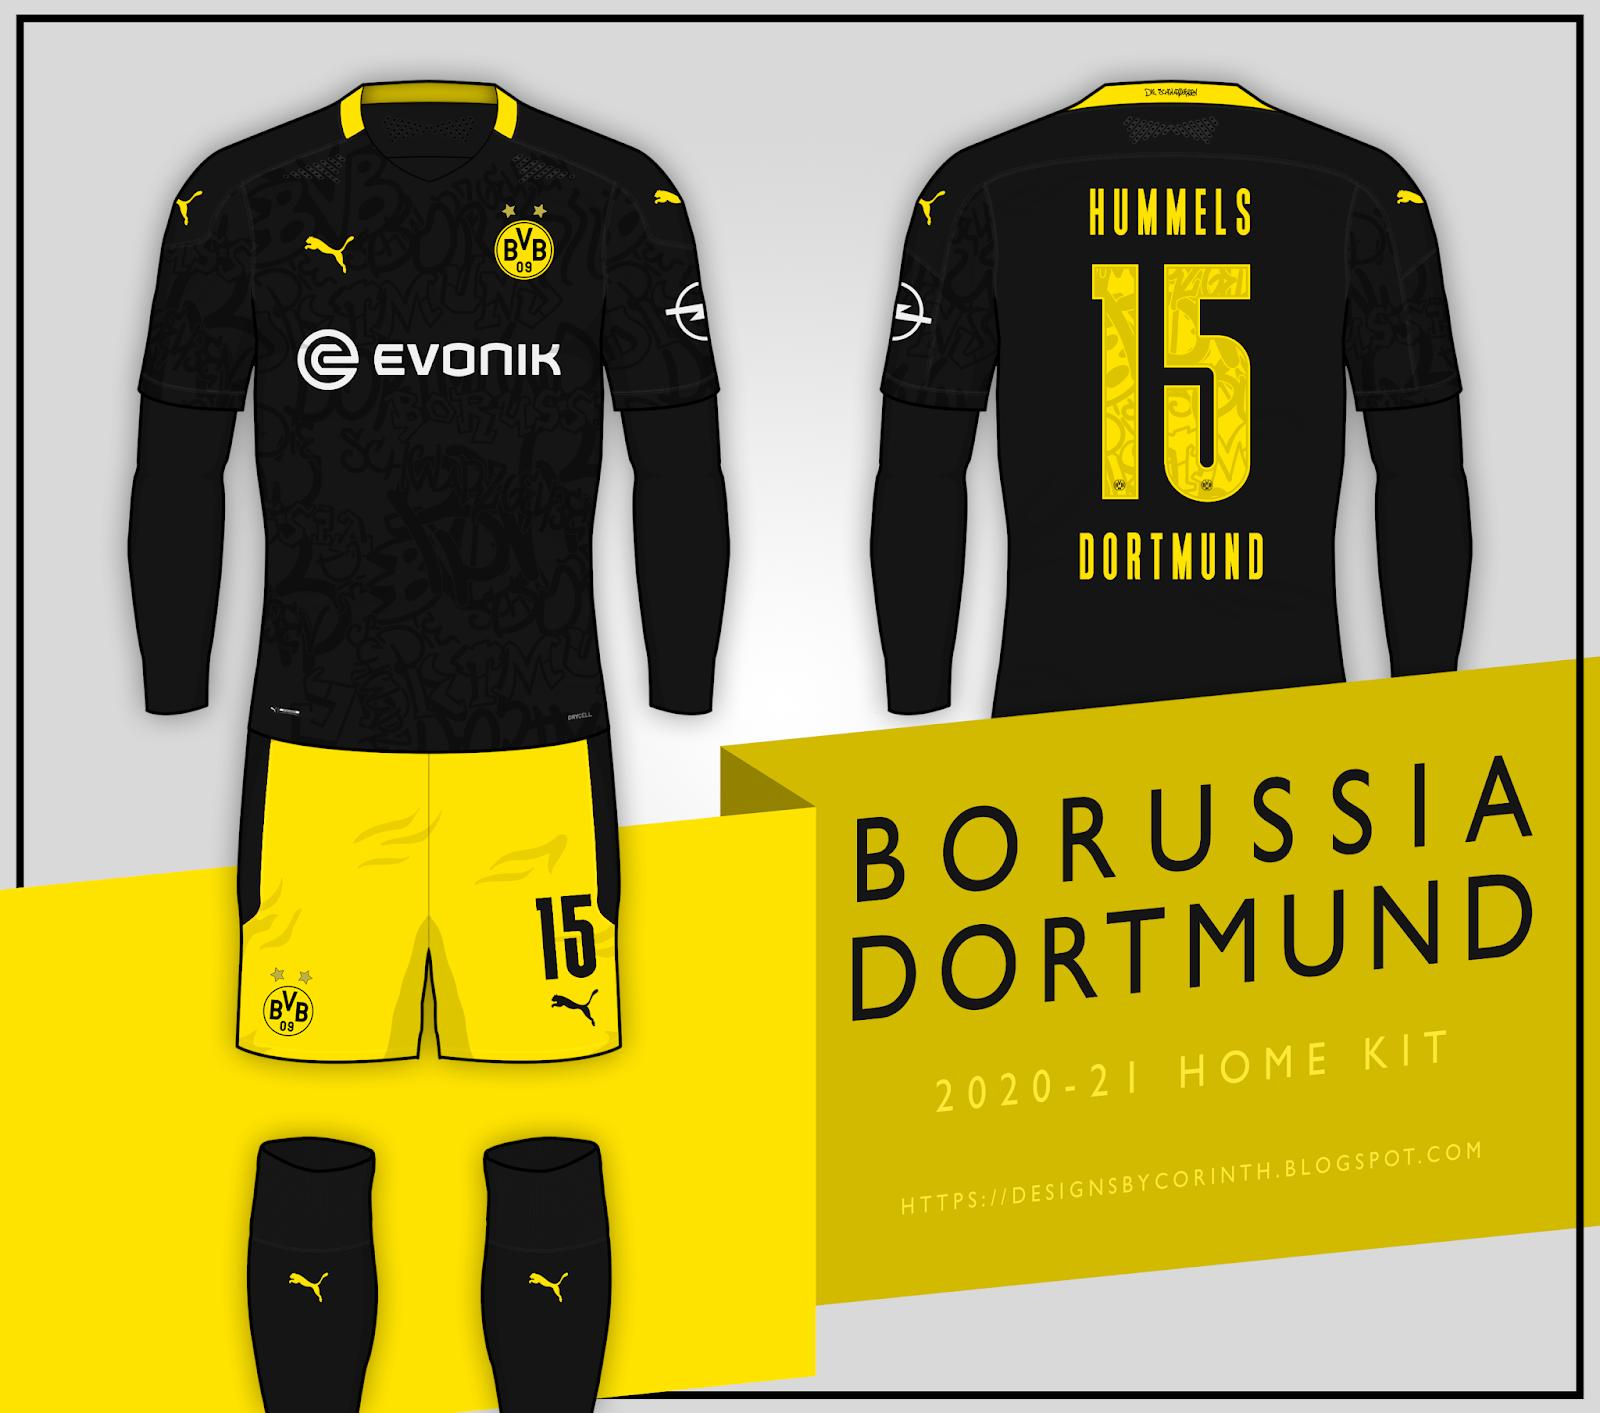 Borussia Dortmund 2020 21 Away Kit Prediction According To Leaks